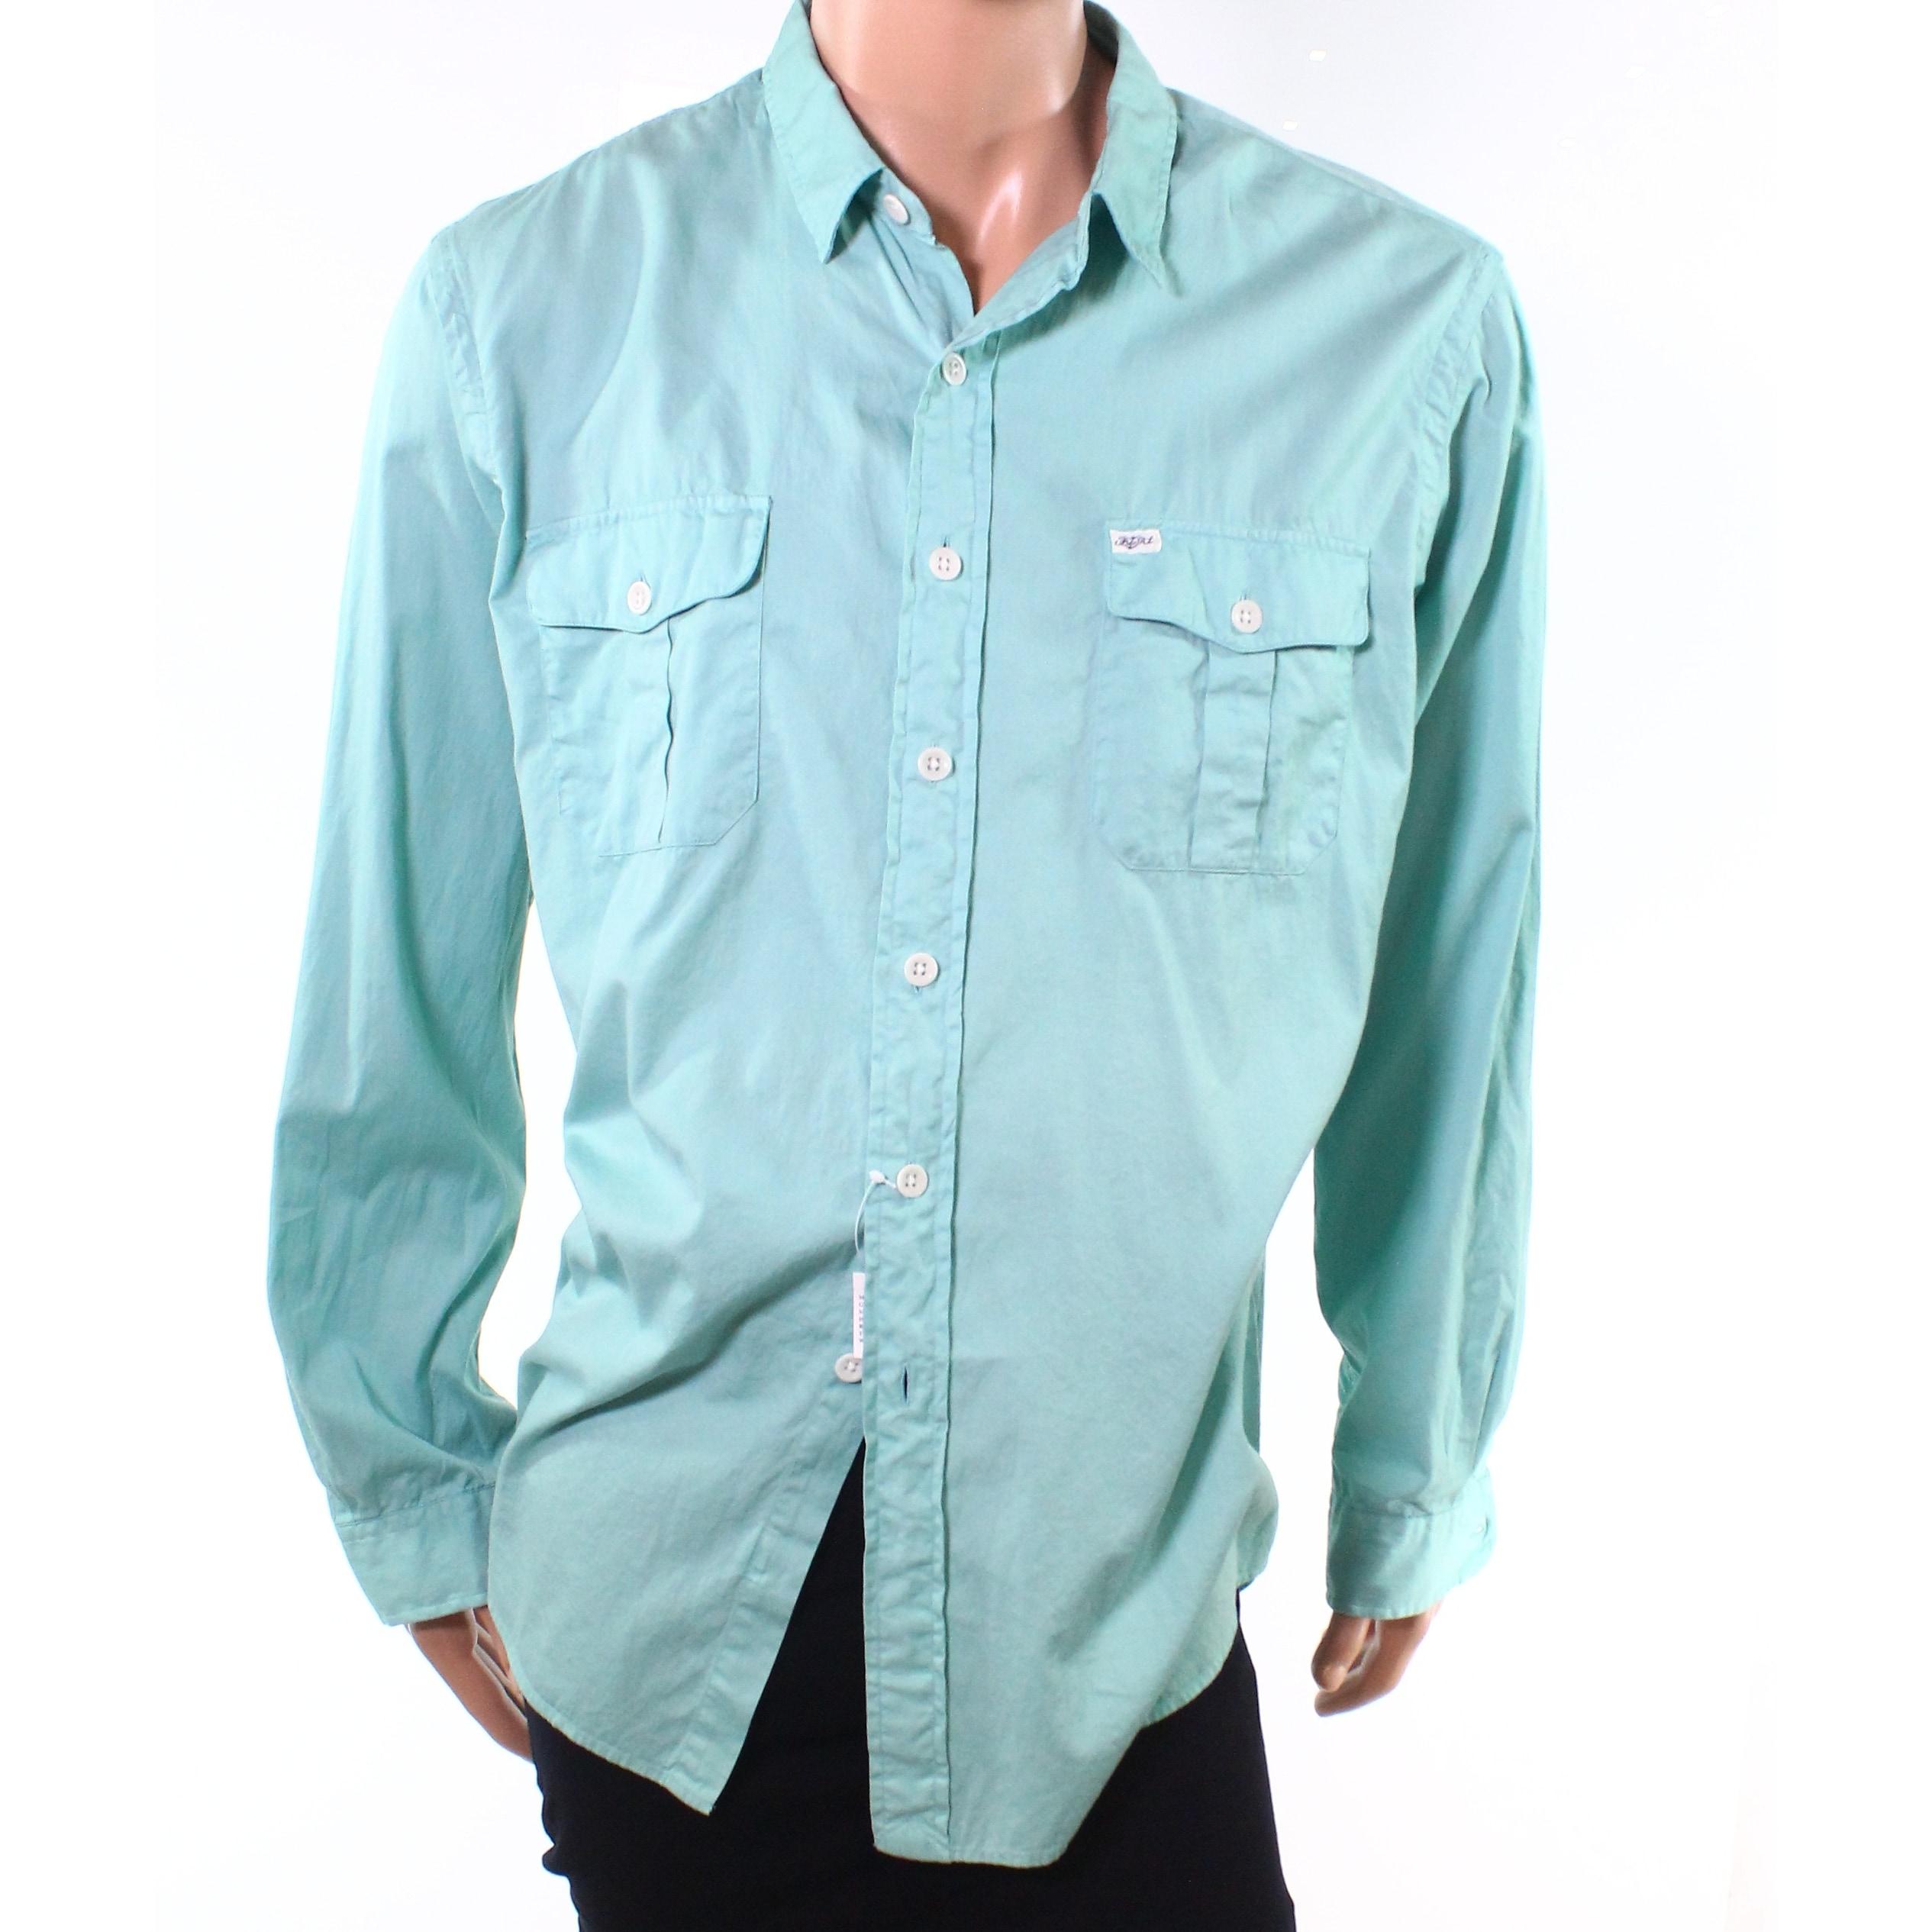 fe35cde5 Mens Twill Shirts Button Down | Top Mode Depot